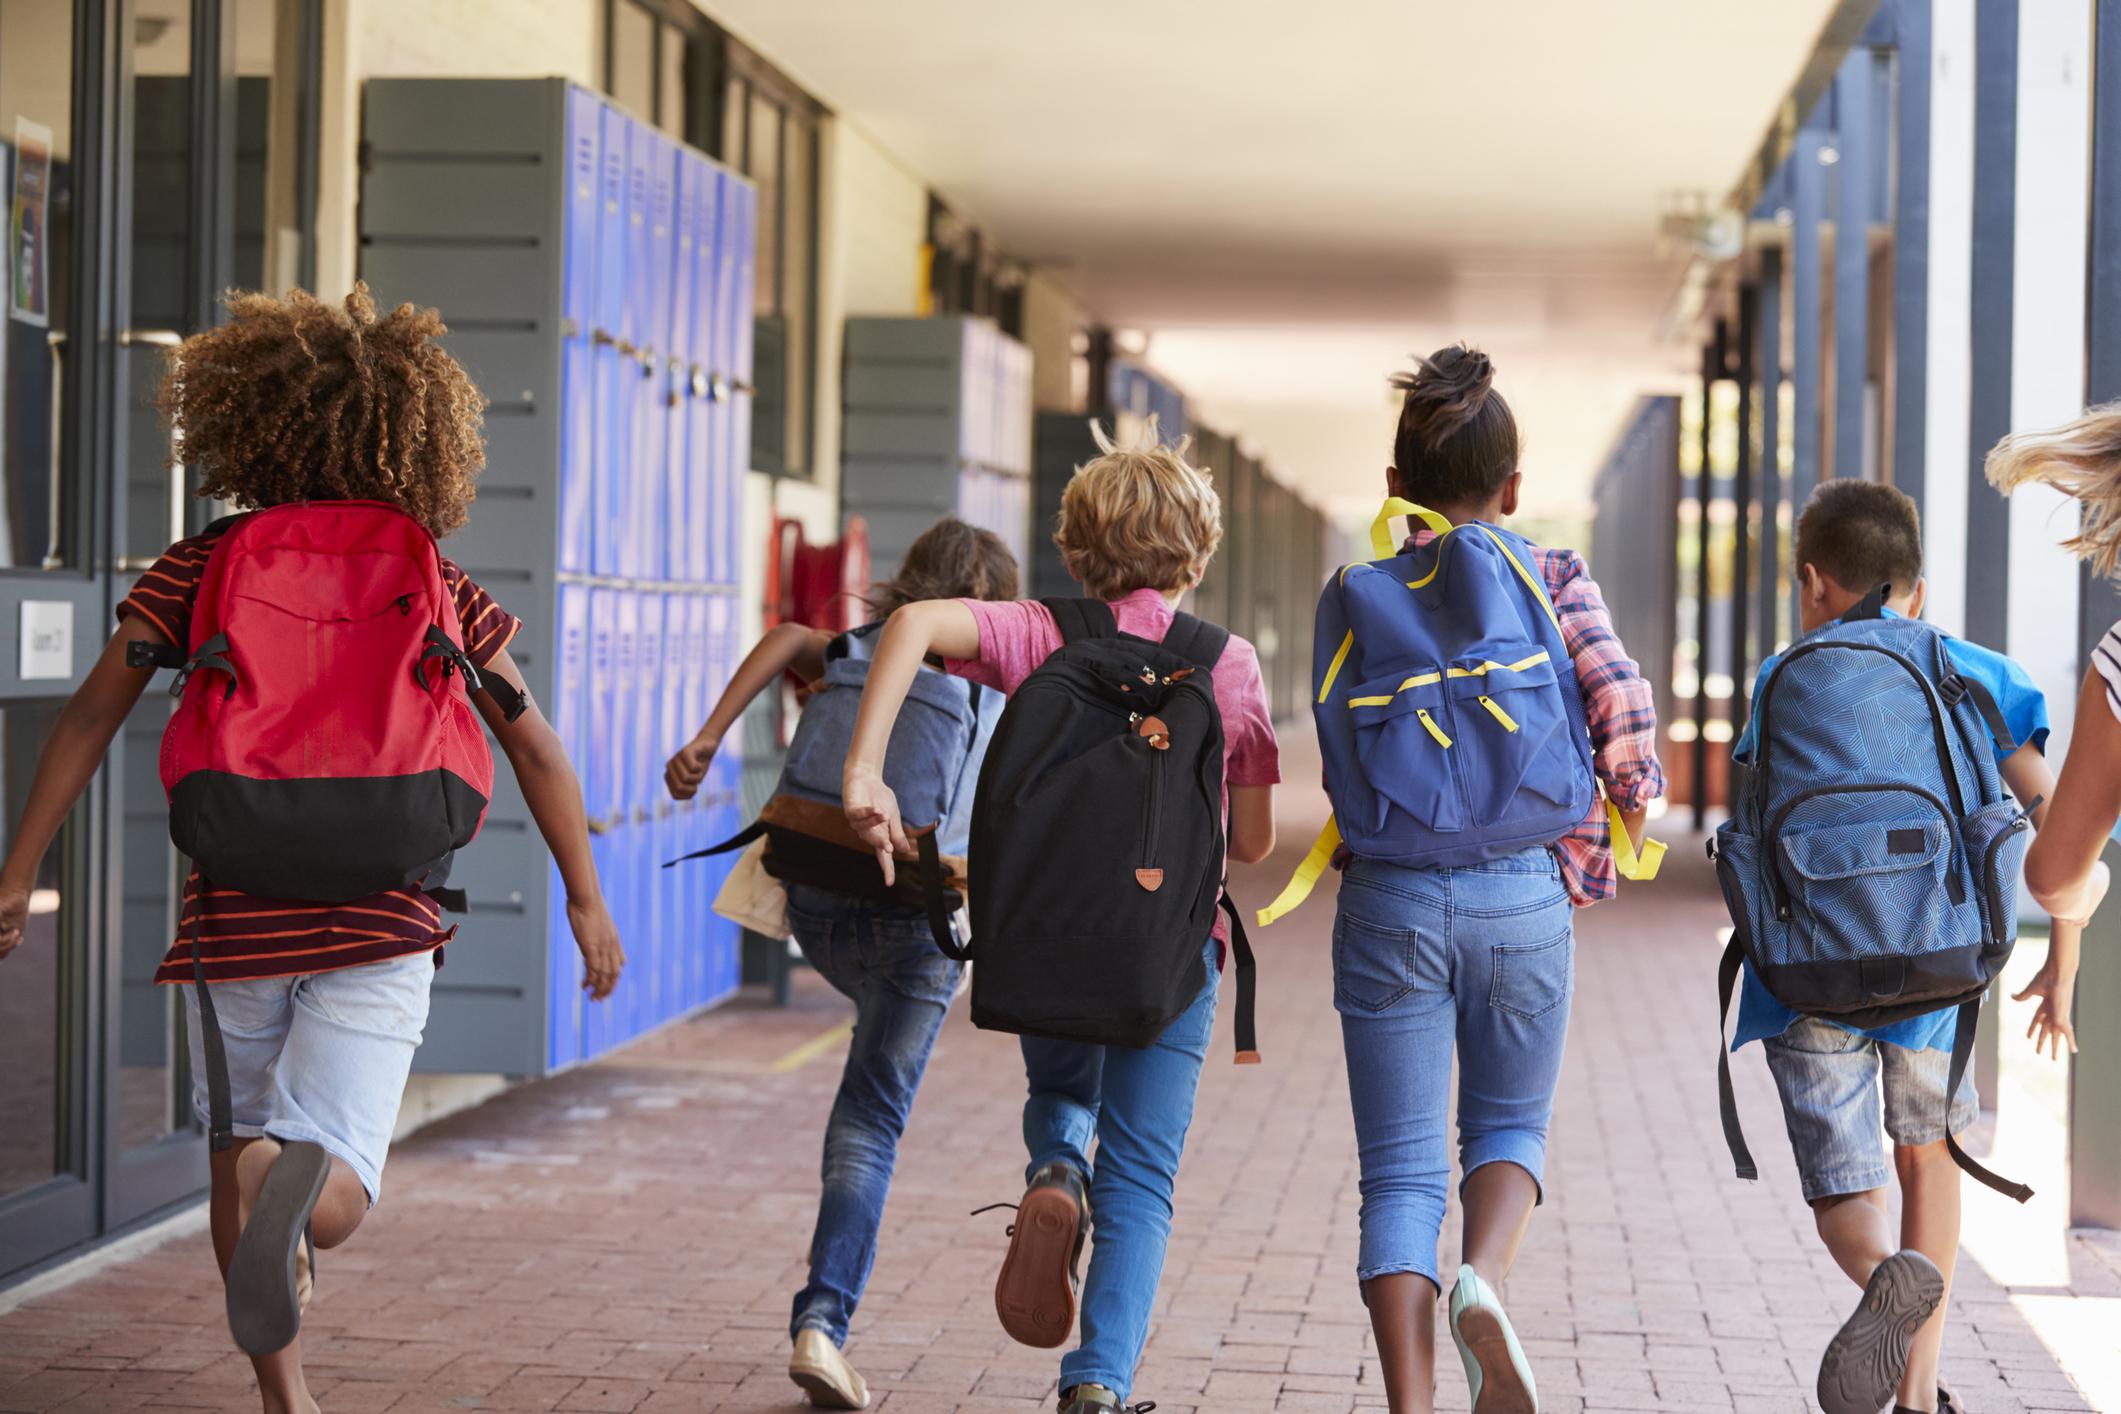 School kids running in elementary school hallway, back view